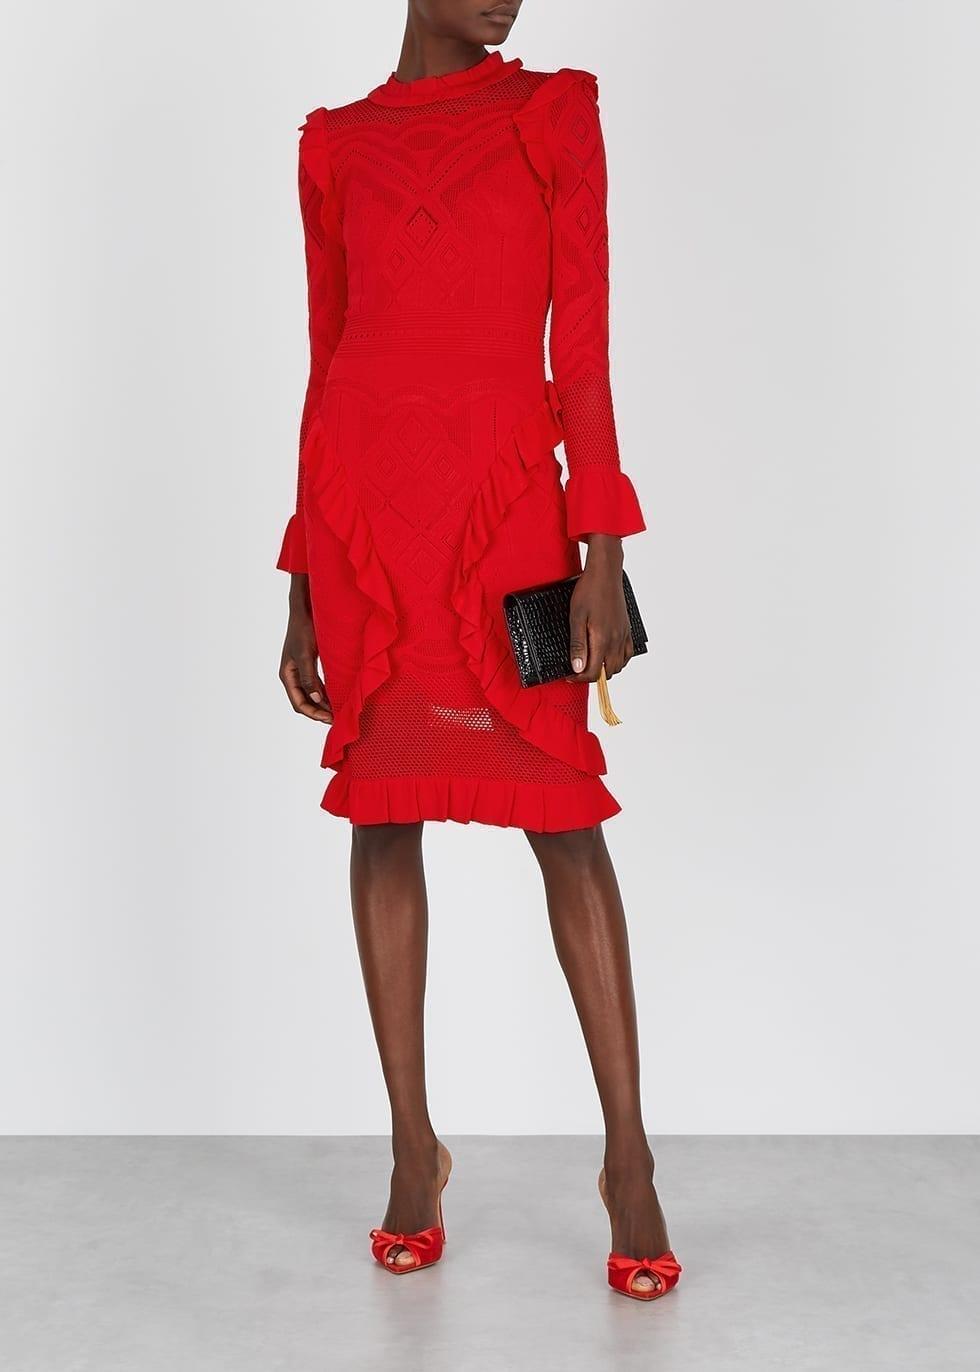 ALEXIS Sivan Red Pointelle-knit Dress